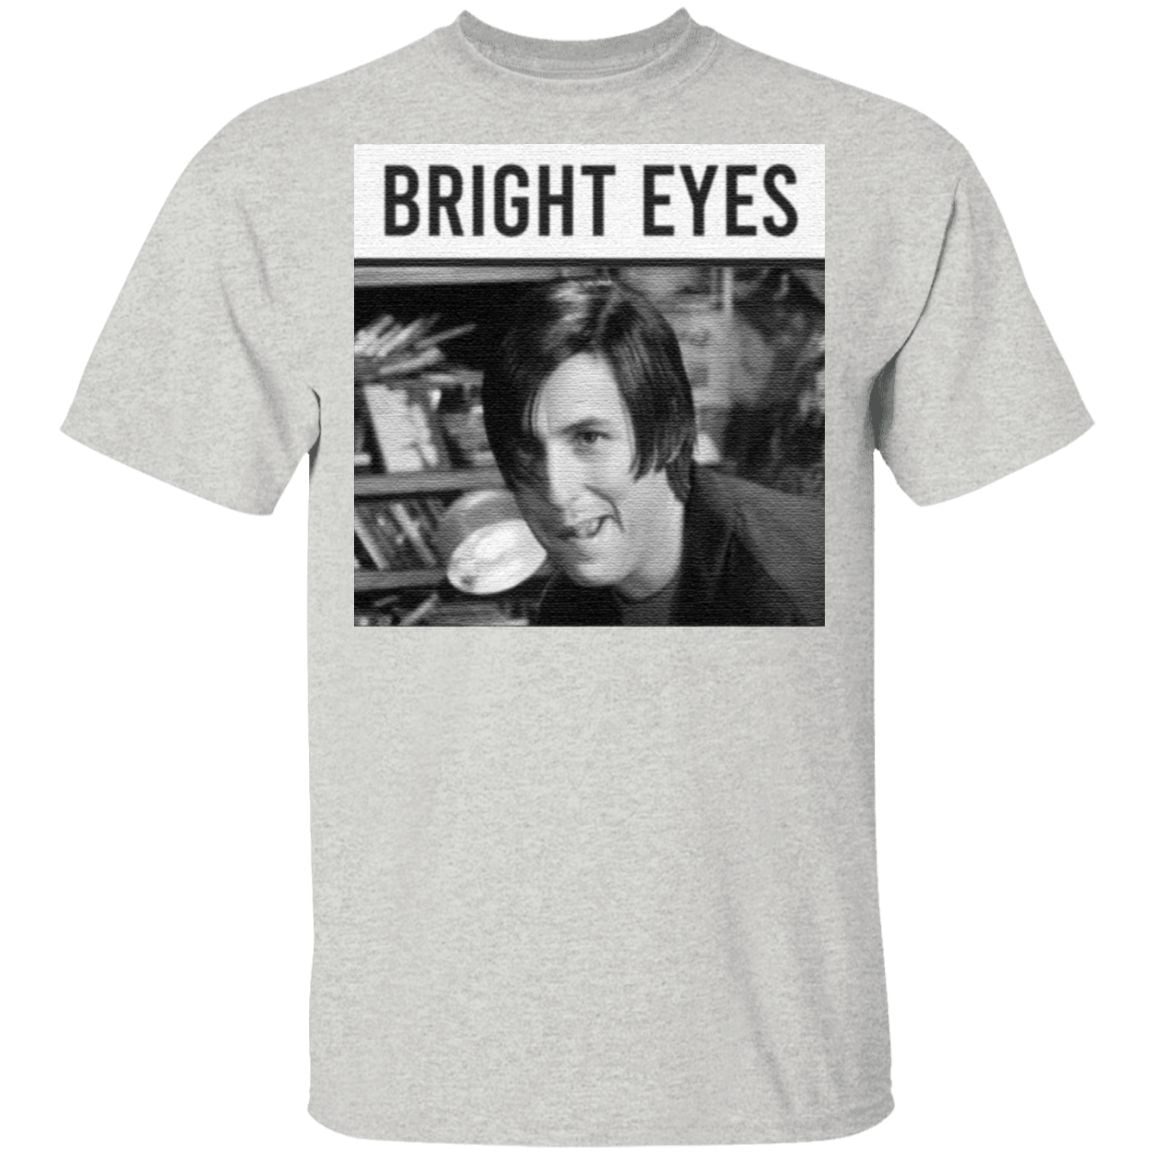 Little Nicky bright eyes t shirt